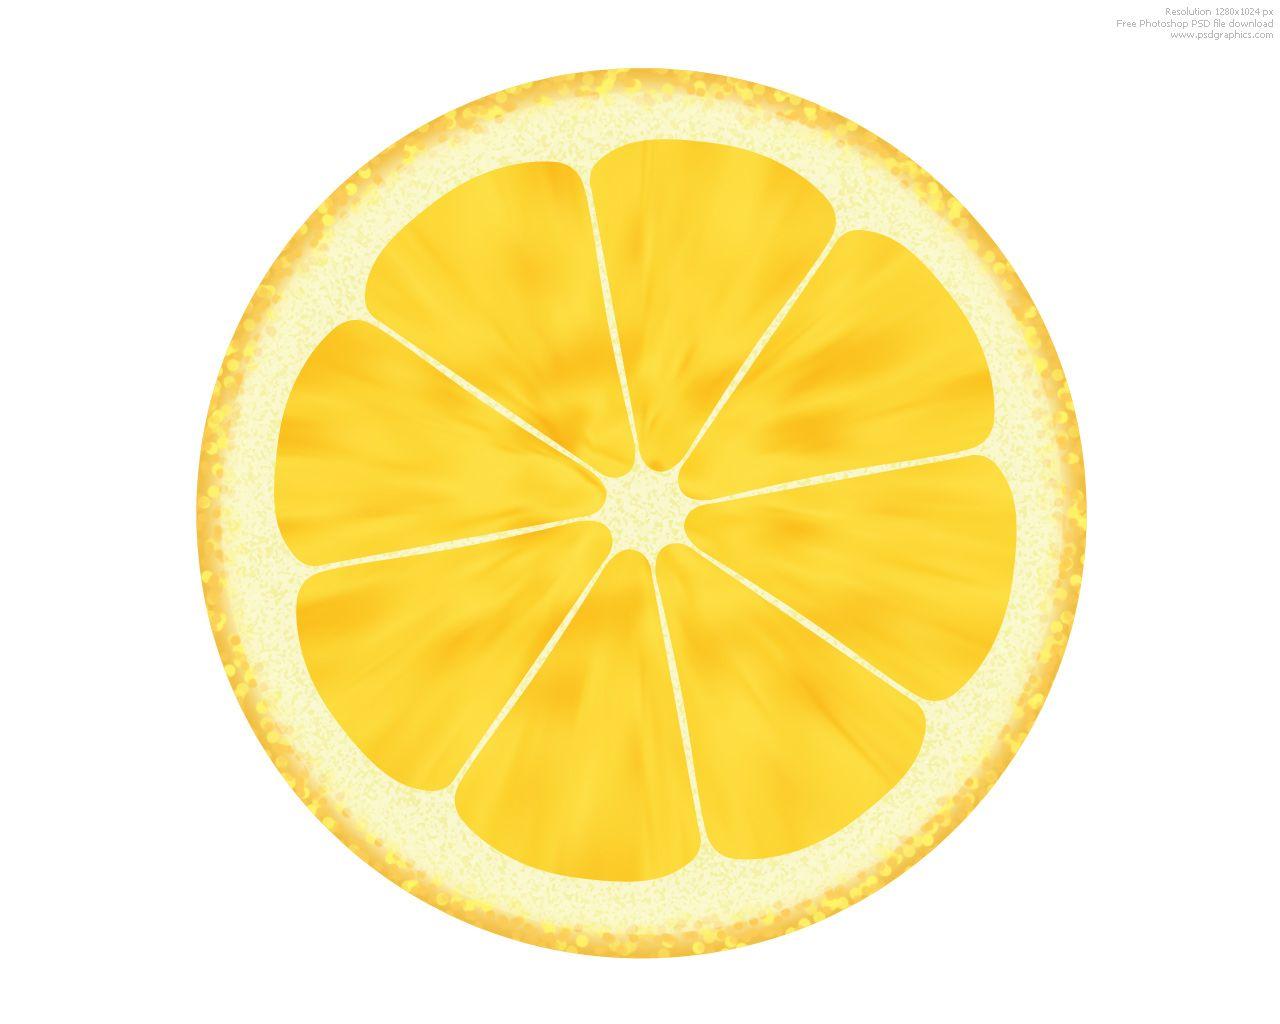 1280x1024 Lemon Slice Drawing Lemon Slice Clip Art Crafts